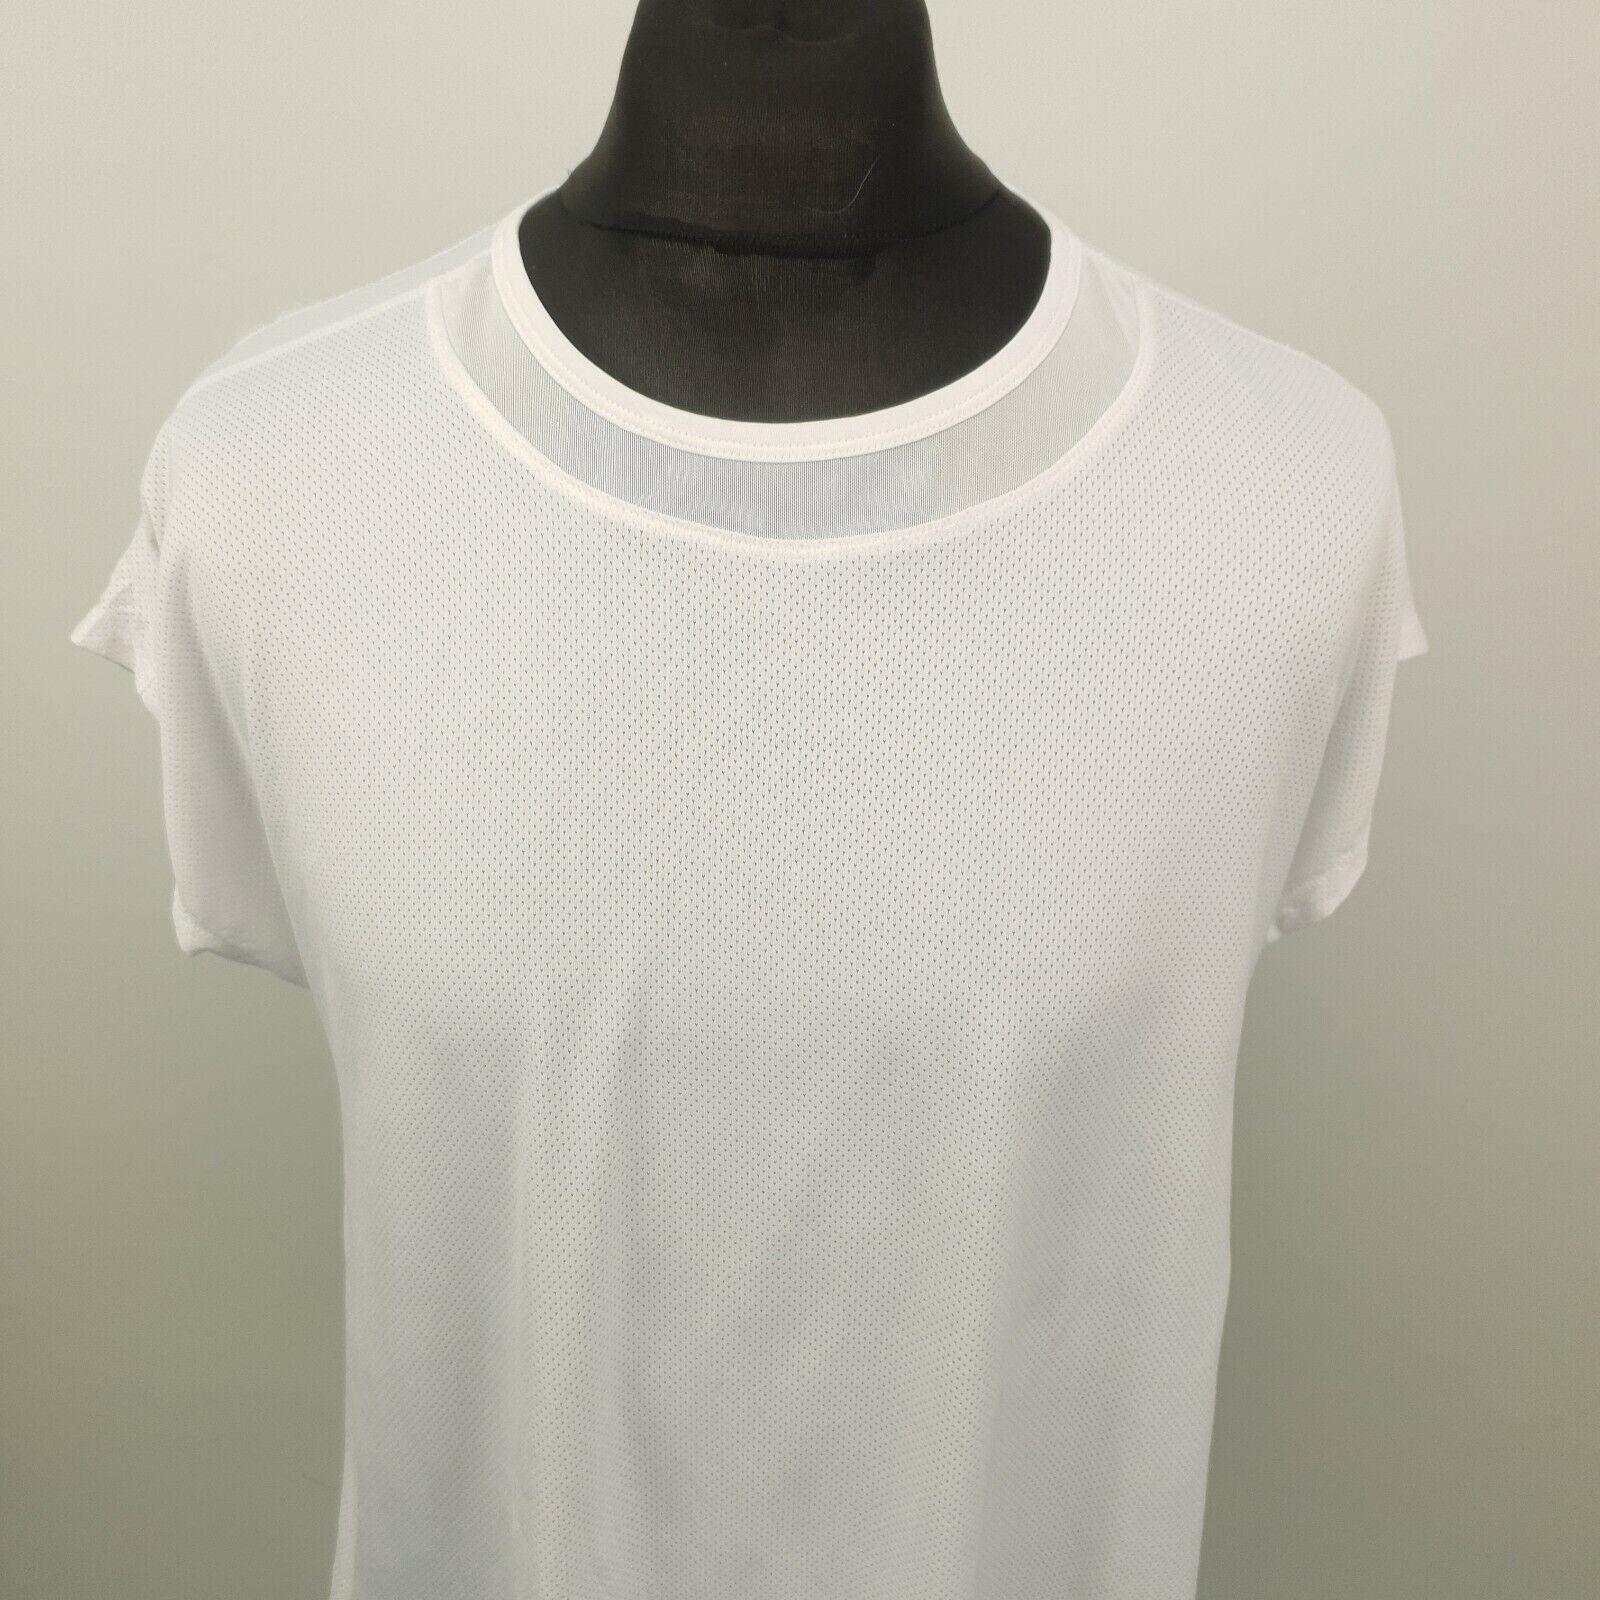 Champion Womens T-Shirt Active Top Shirt RUNNING GYM 2XL White Regular